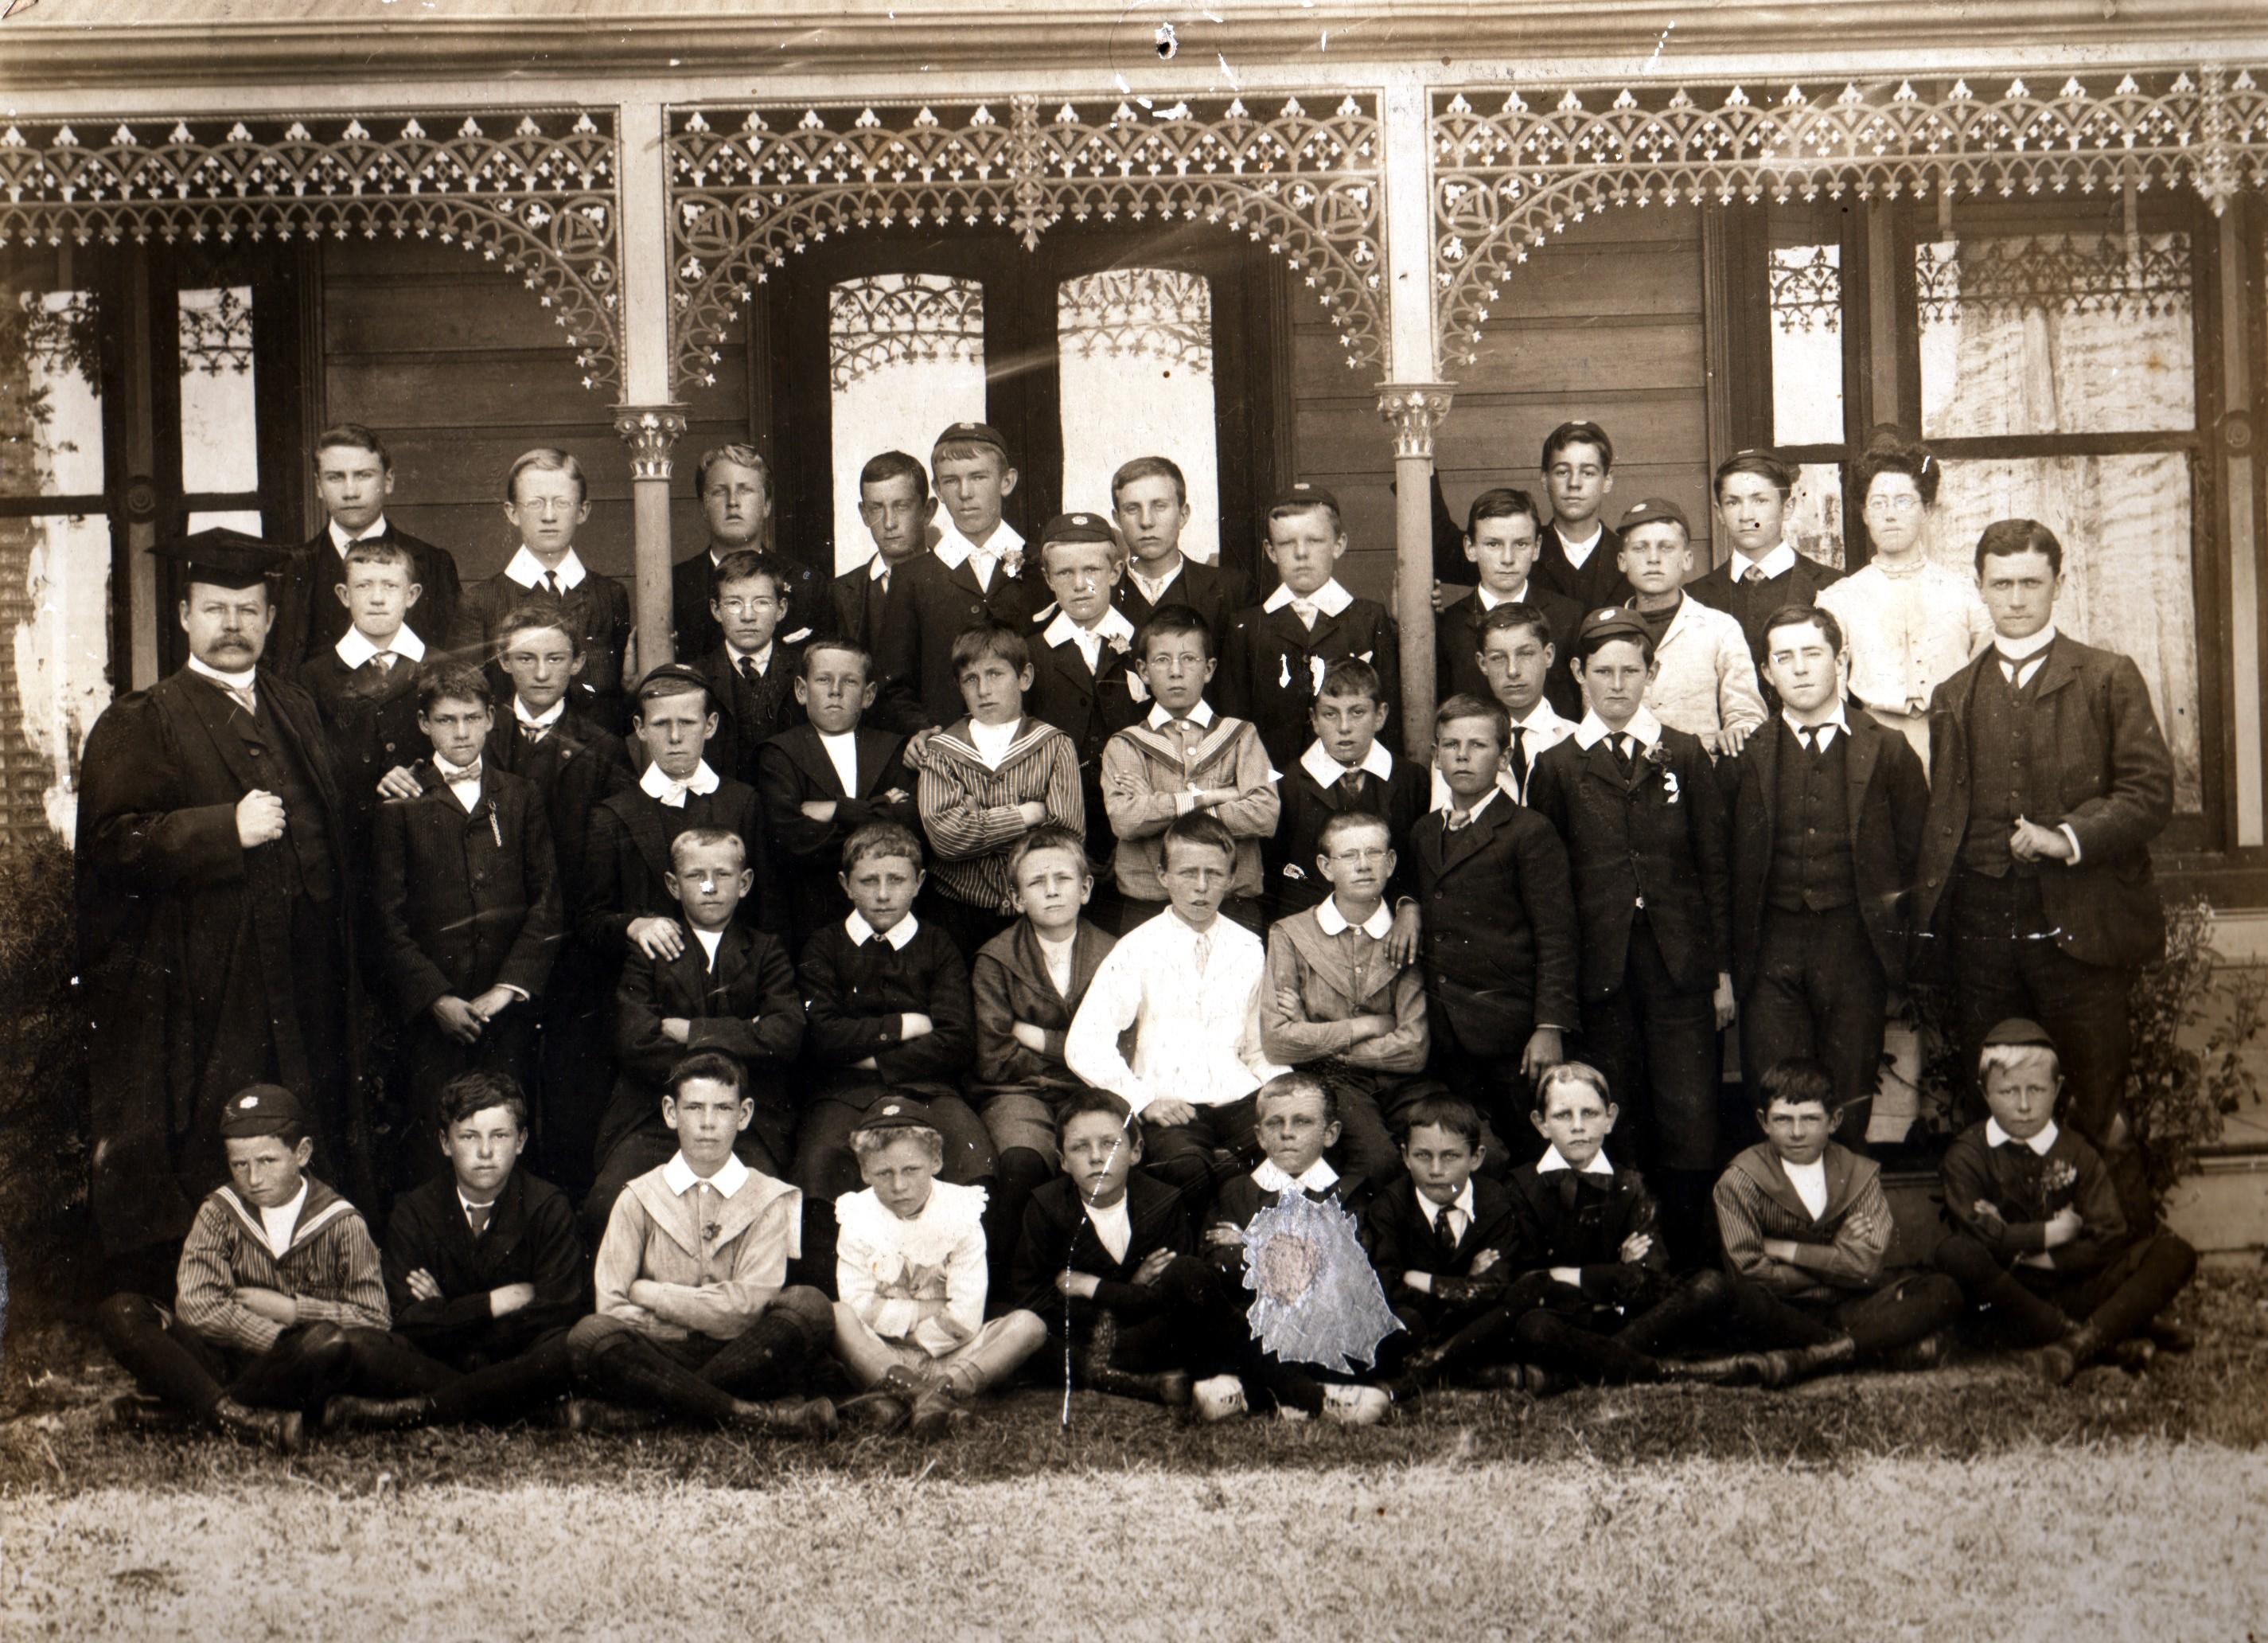 BHGS at Rose Street-Headmaster Murray Coghill at left- 1905